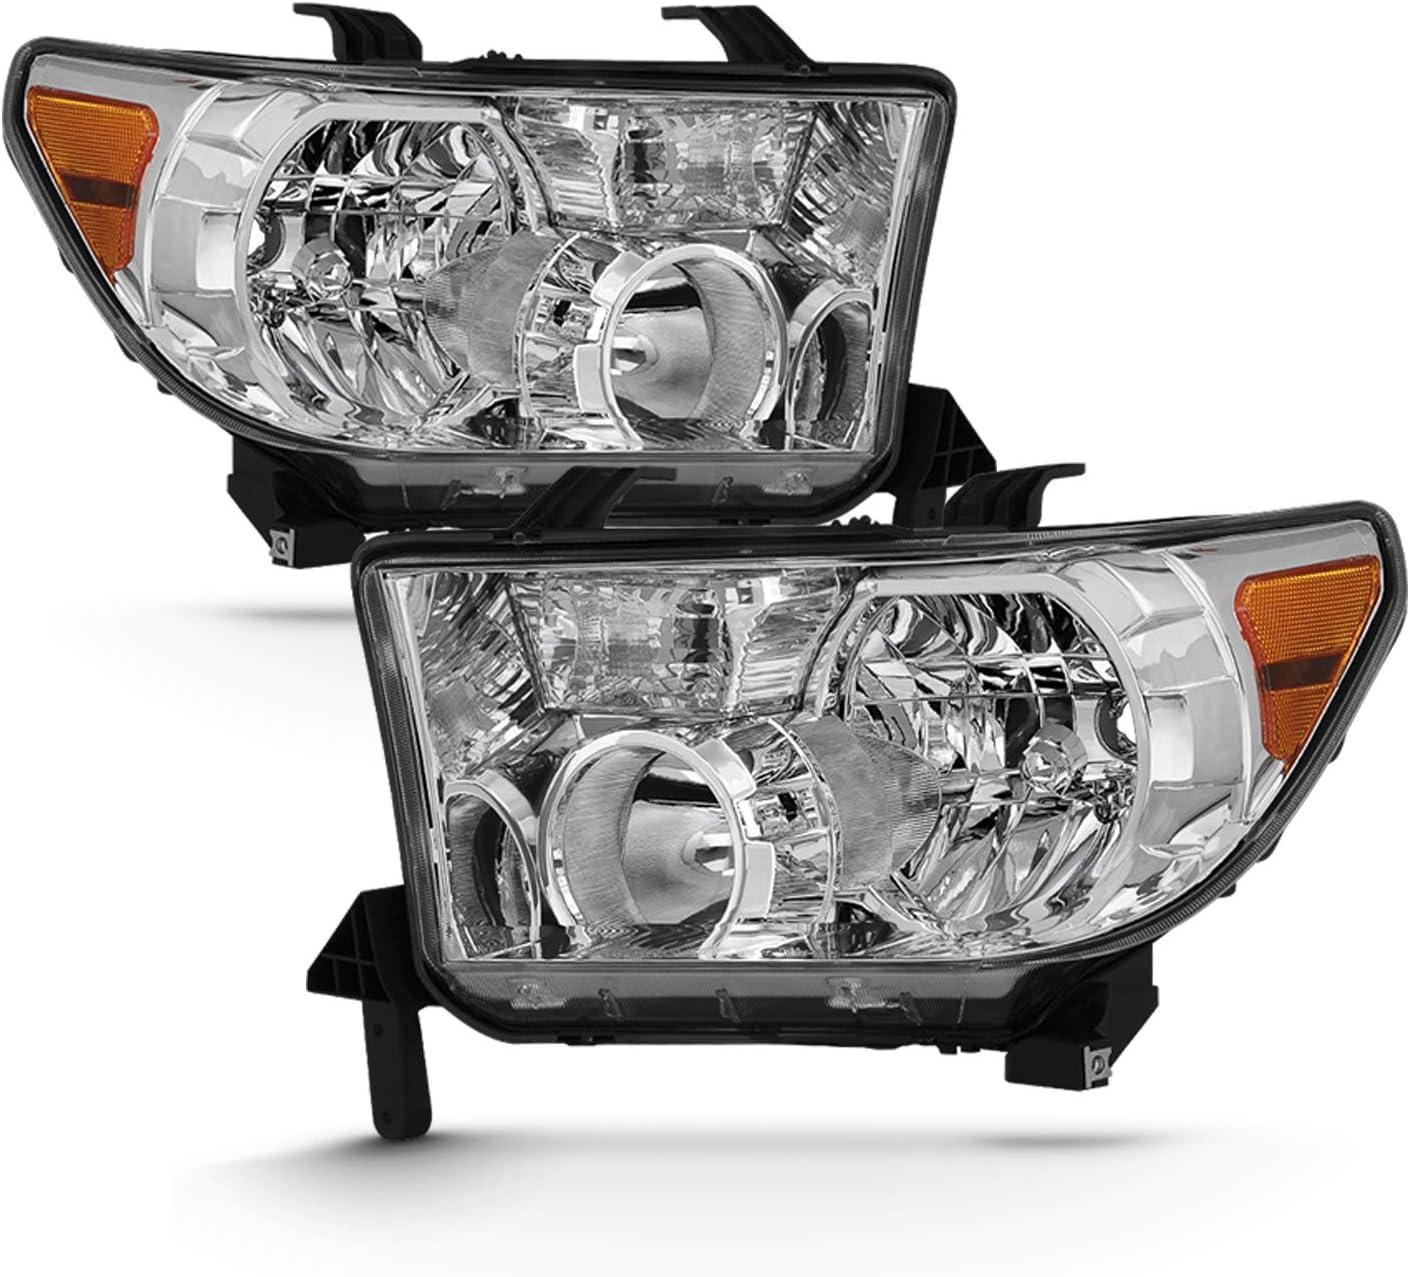 For 2007-2013 Toyota Tundra Headlight Bulb Low Beam Philips 73265SC 2012 2008